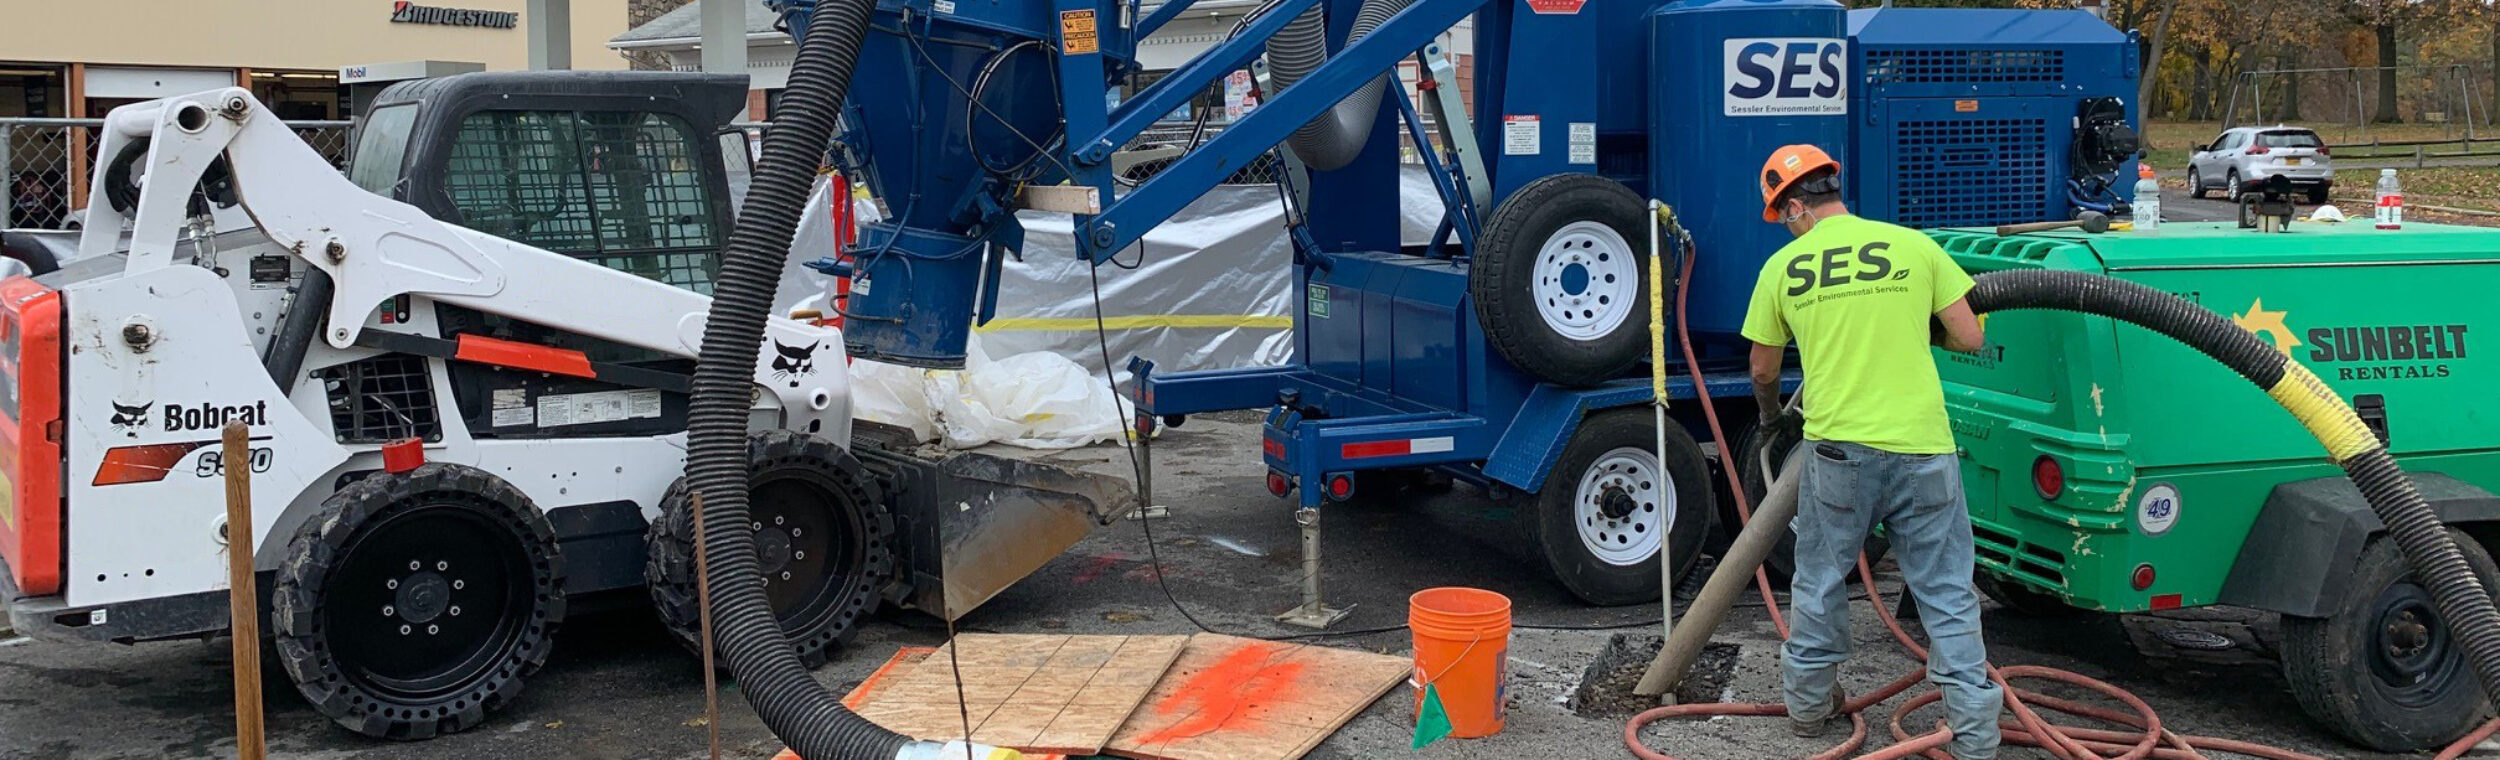 SVE Installation at Fuel Service Station, Eastern New York